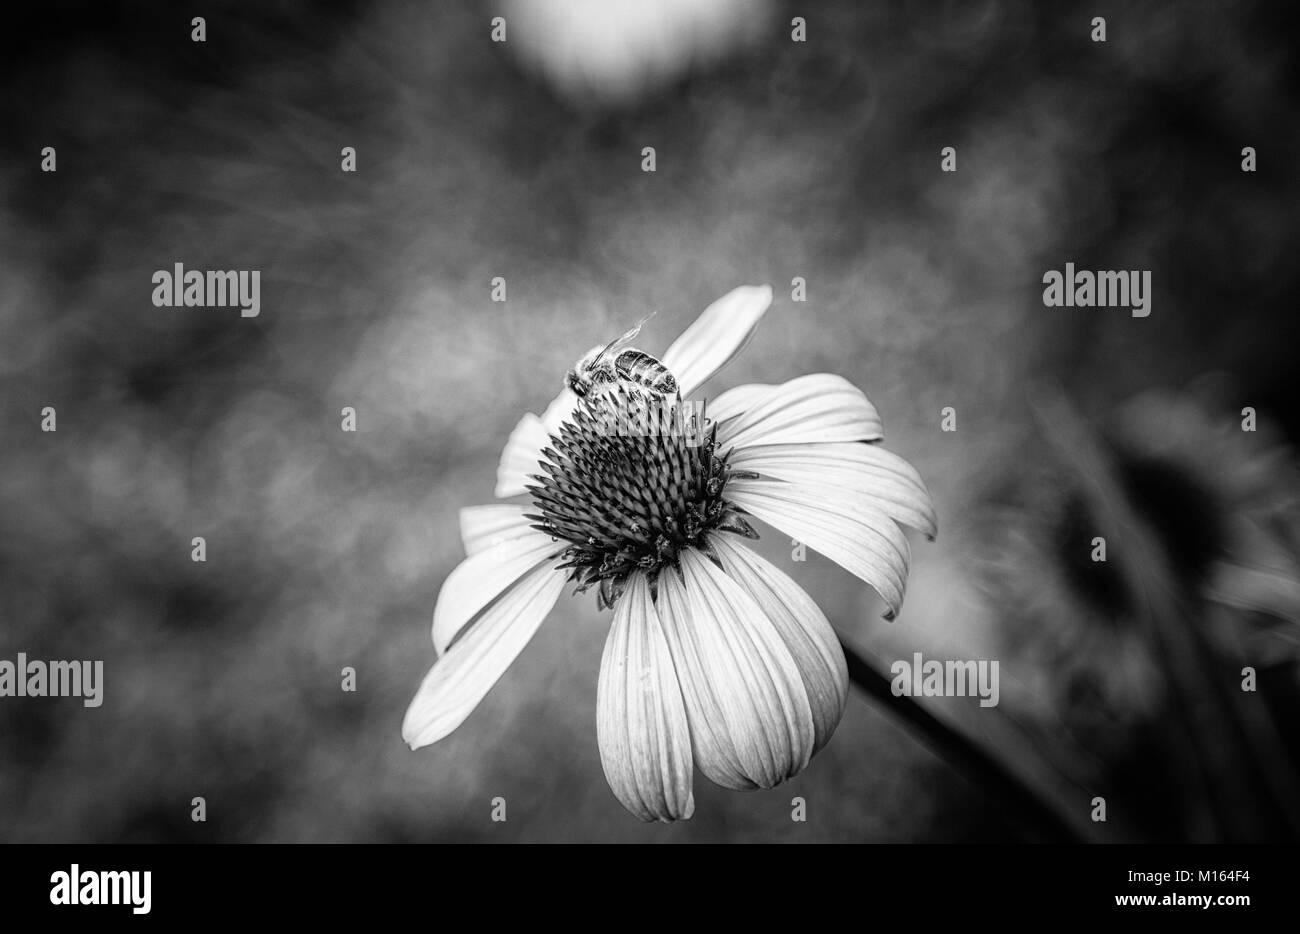 Bee at work on flower (Makro) - Stock Image